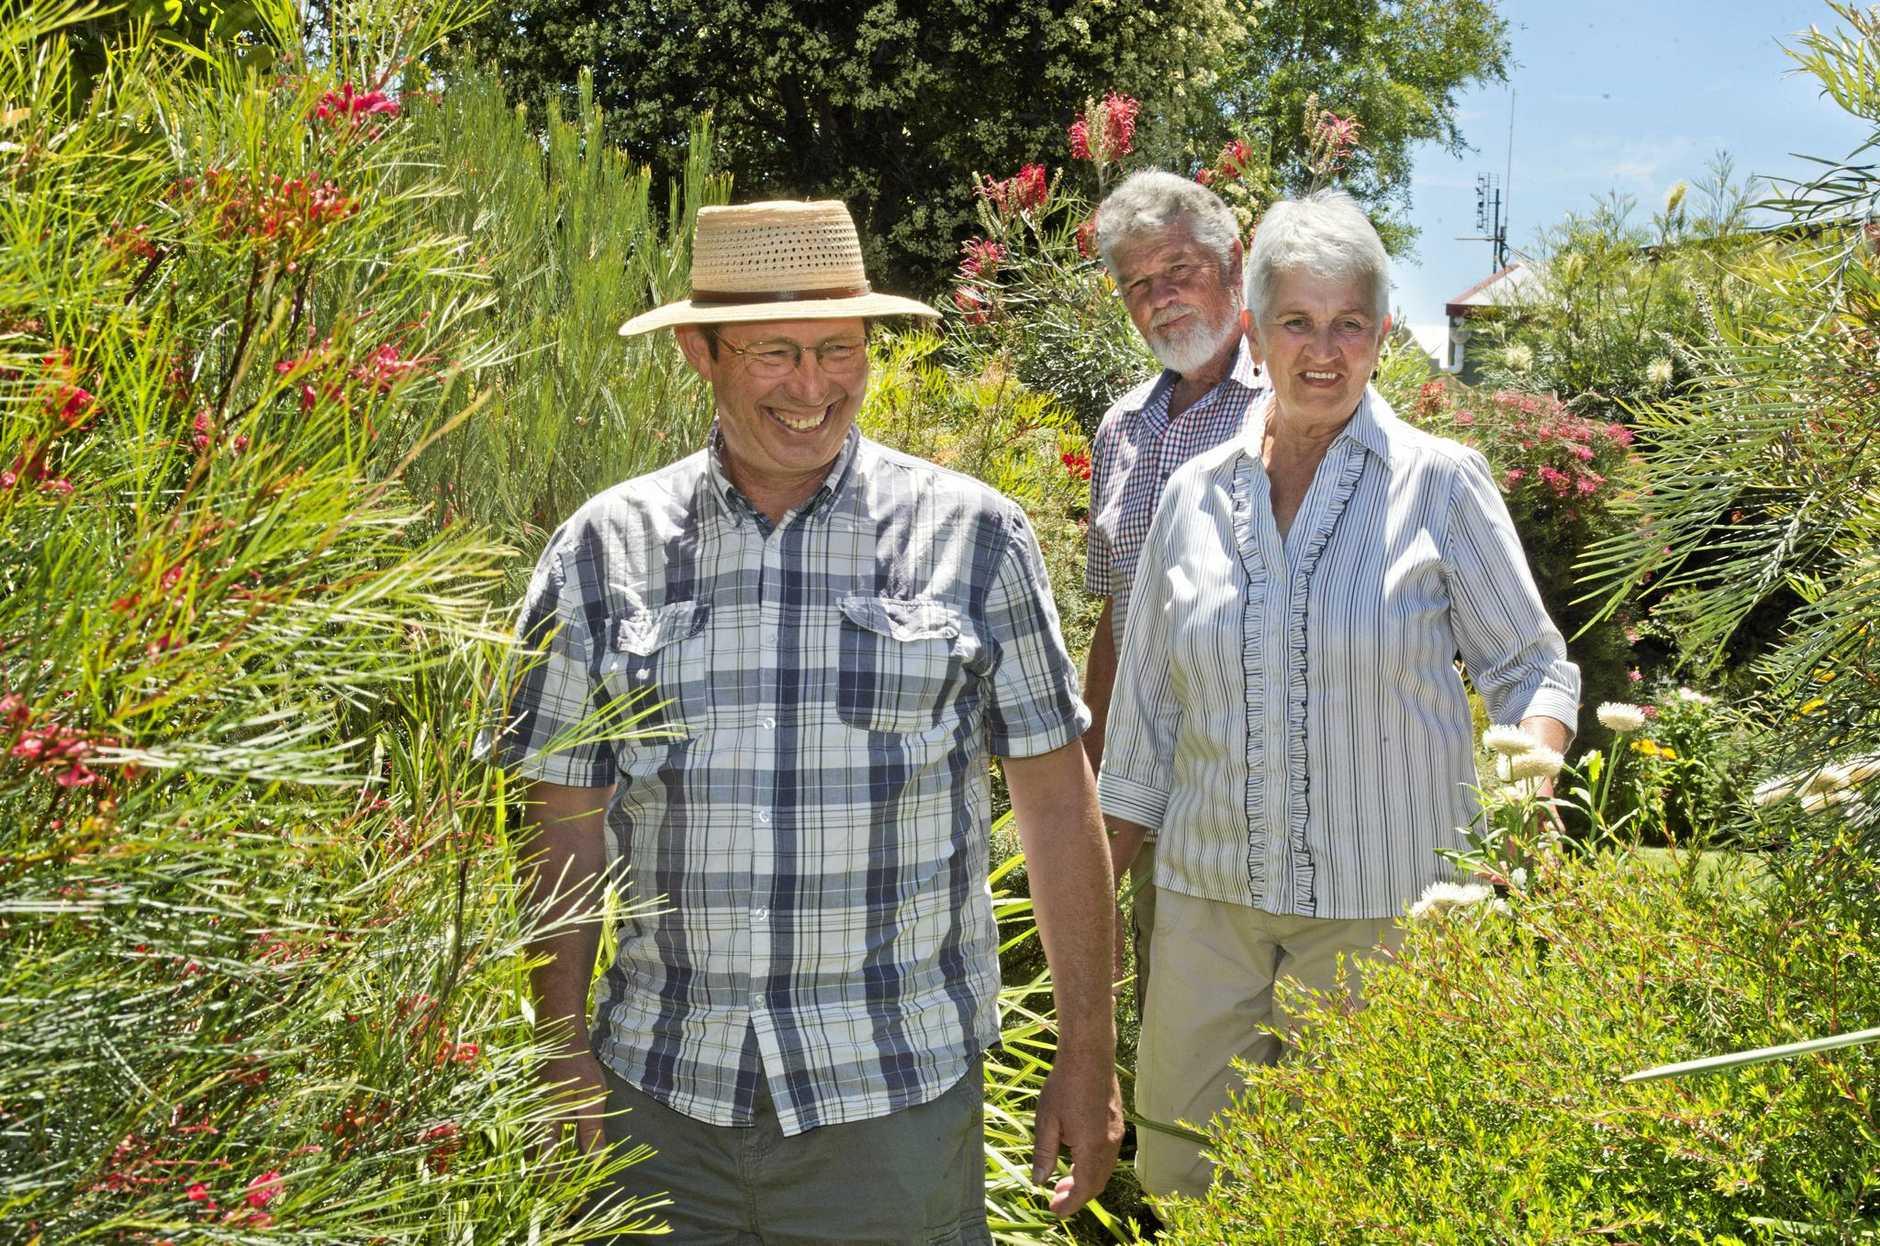 NATIVE OASIS: Gardening Australia presenter Jerry Coleby-Williams (left) visits Highfields gardeners Gordon and Maria Reynolds to film a segment for the show's 2017 season.